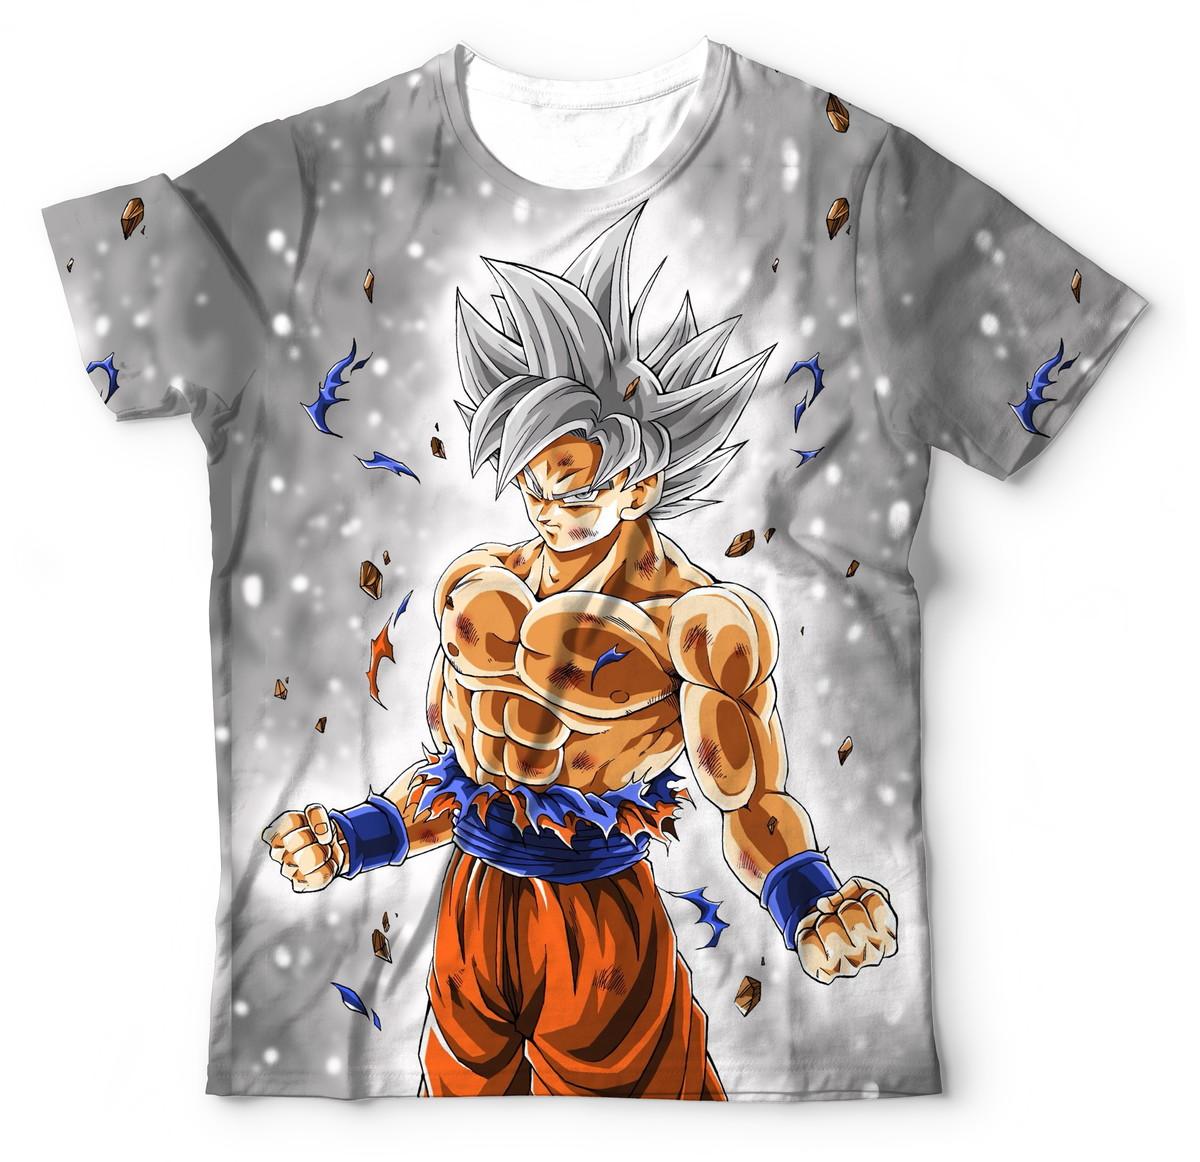 Camisa Camiseta Goku Instinto Superior Completo Dbz Super